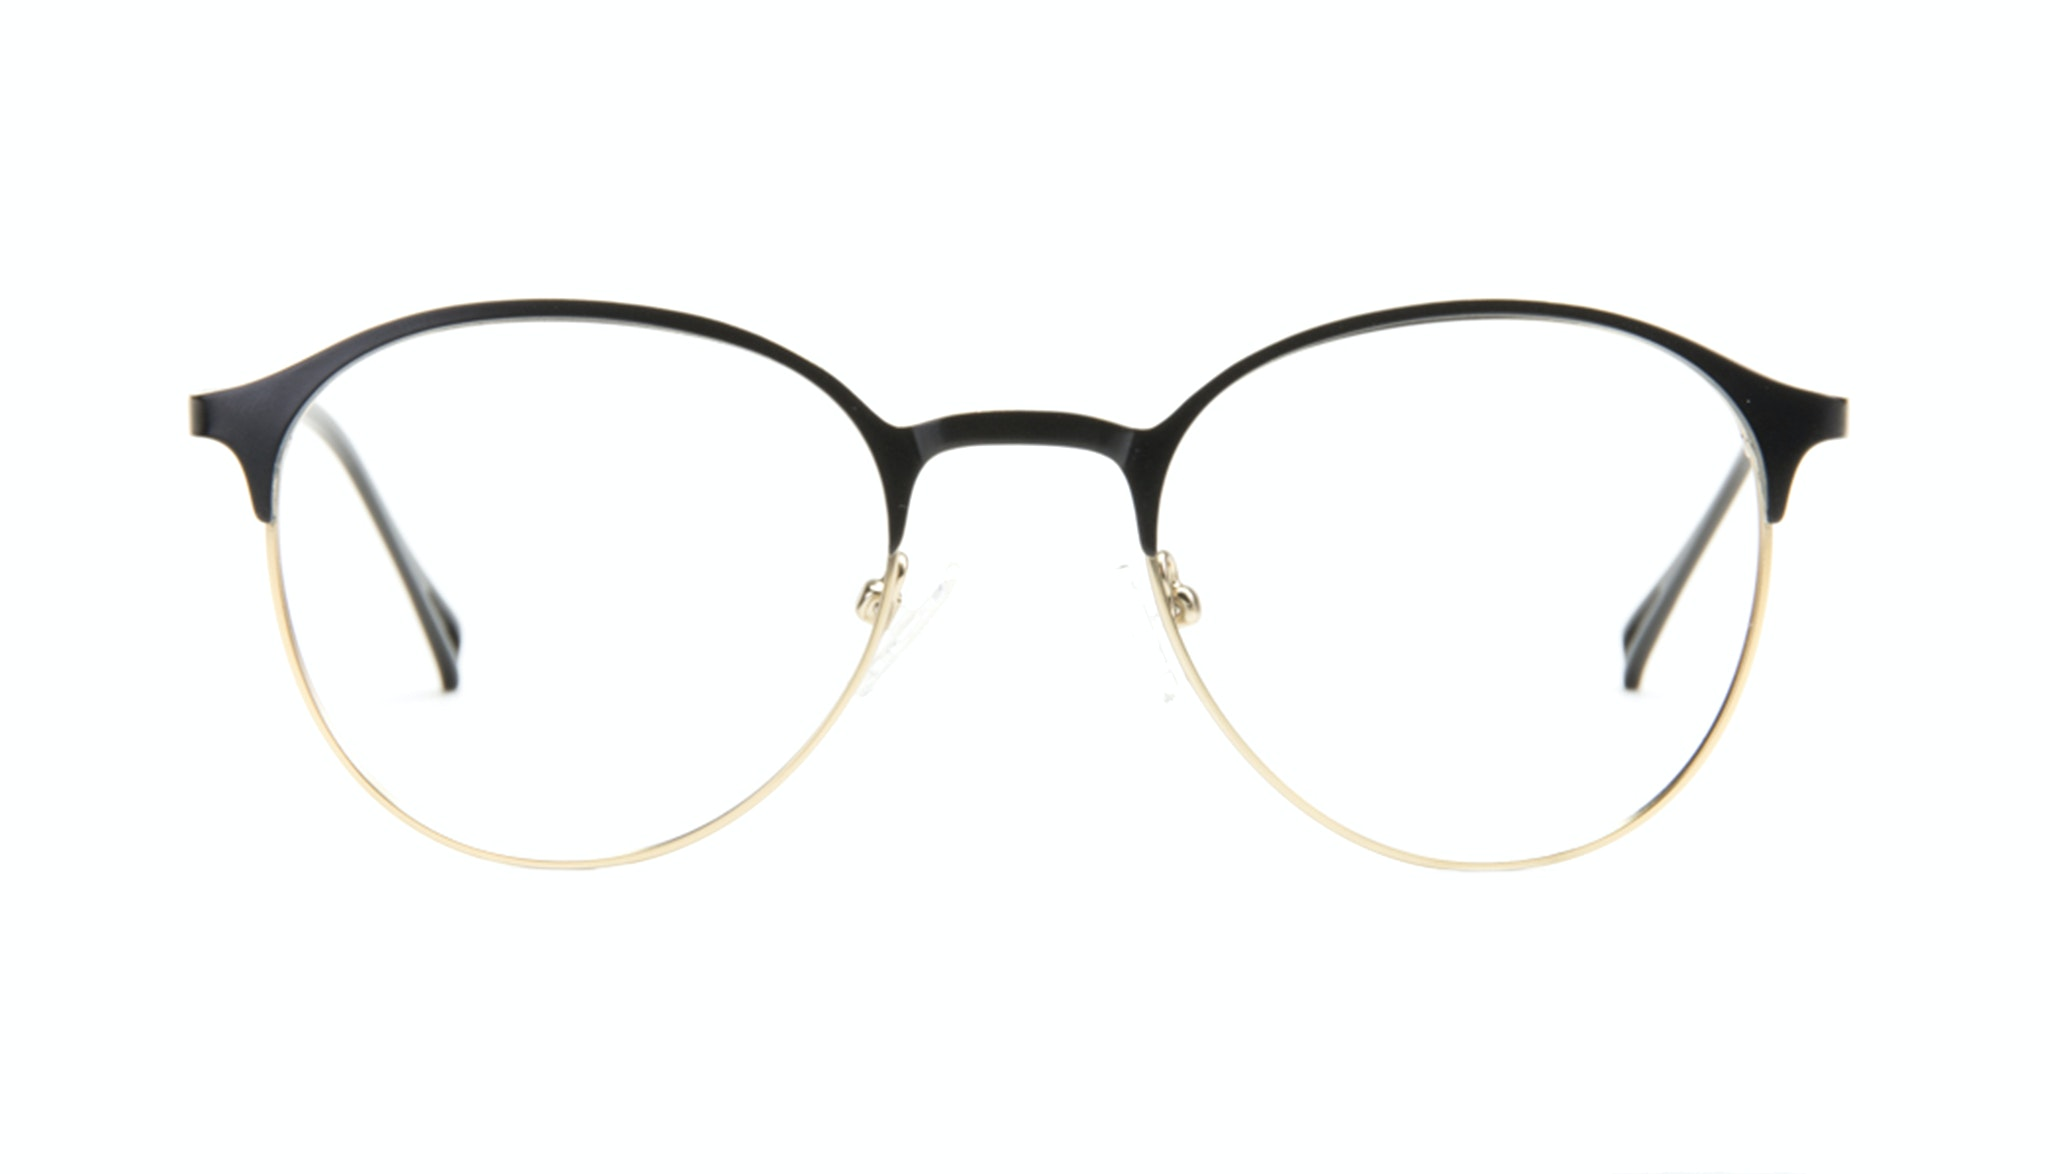 Affordable Fashion Glasses Round Eyeglasses Women Bay Deep Gold